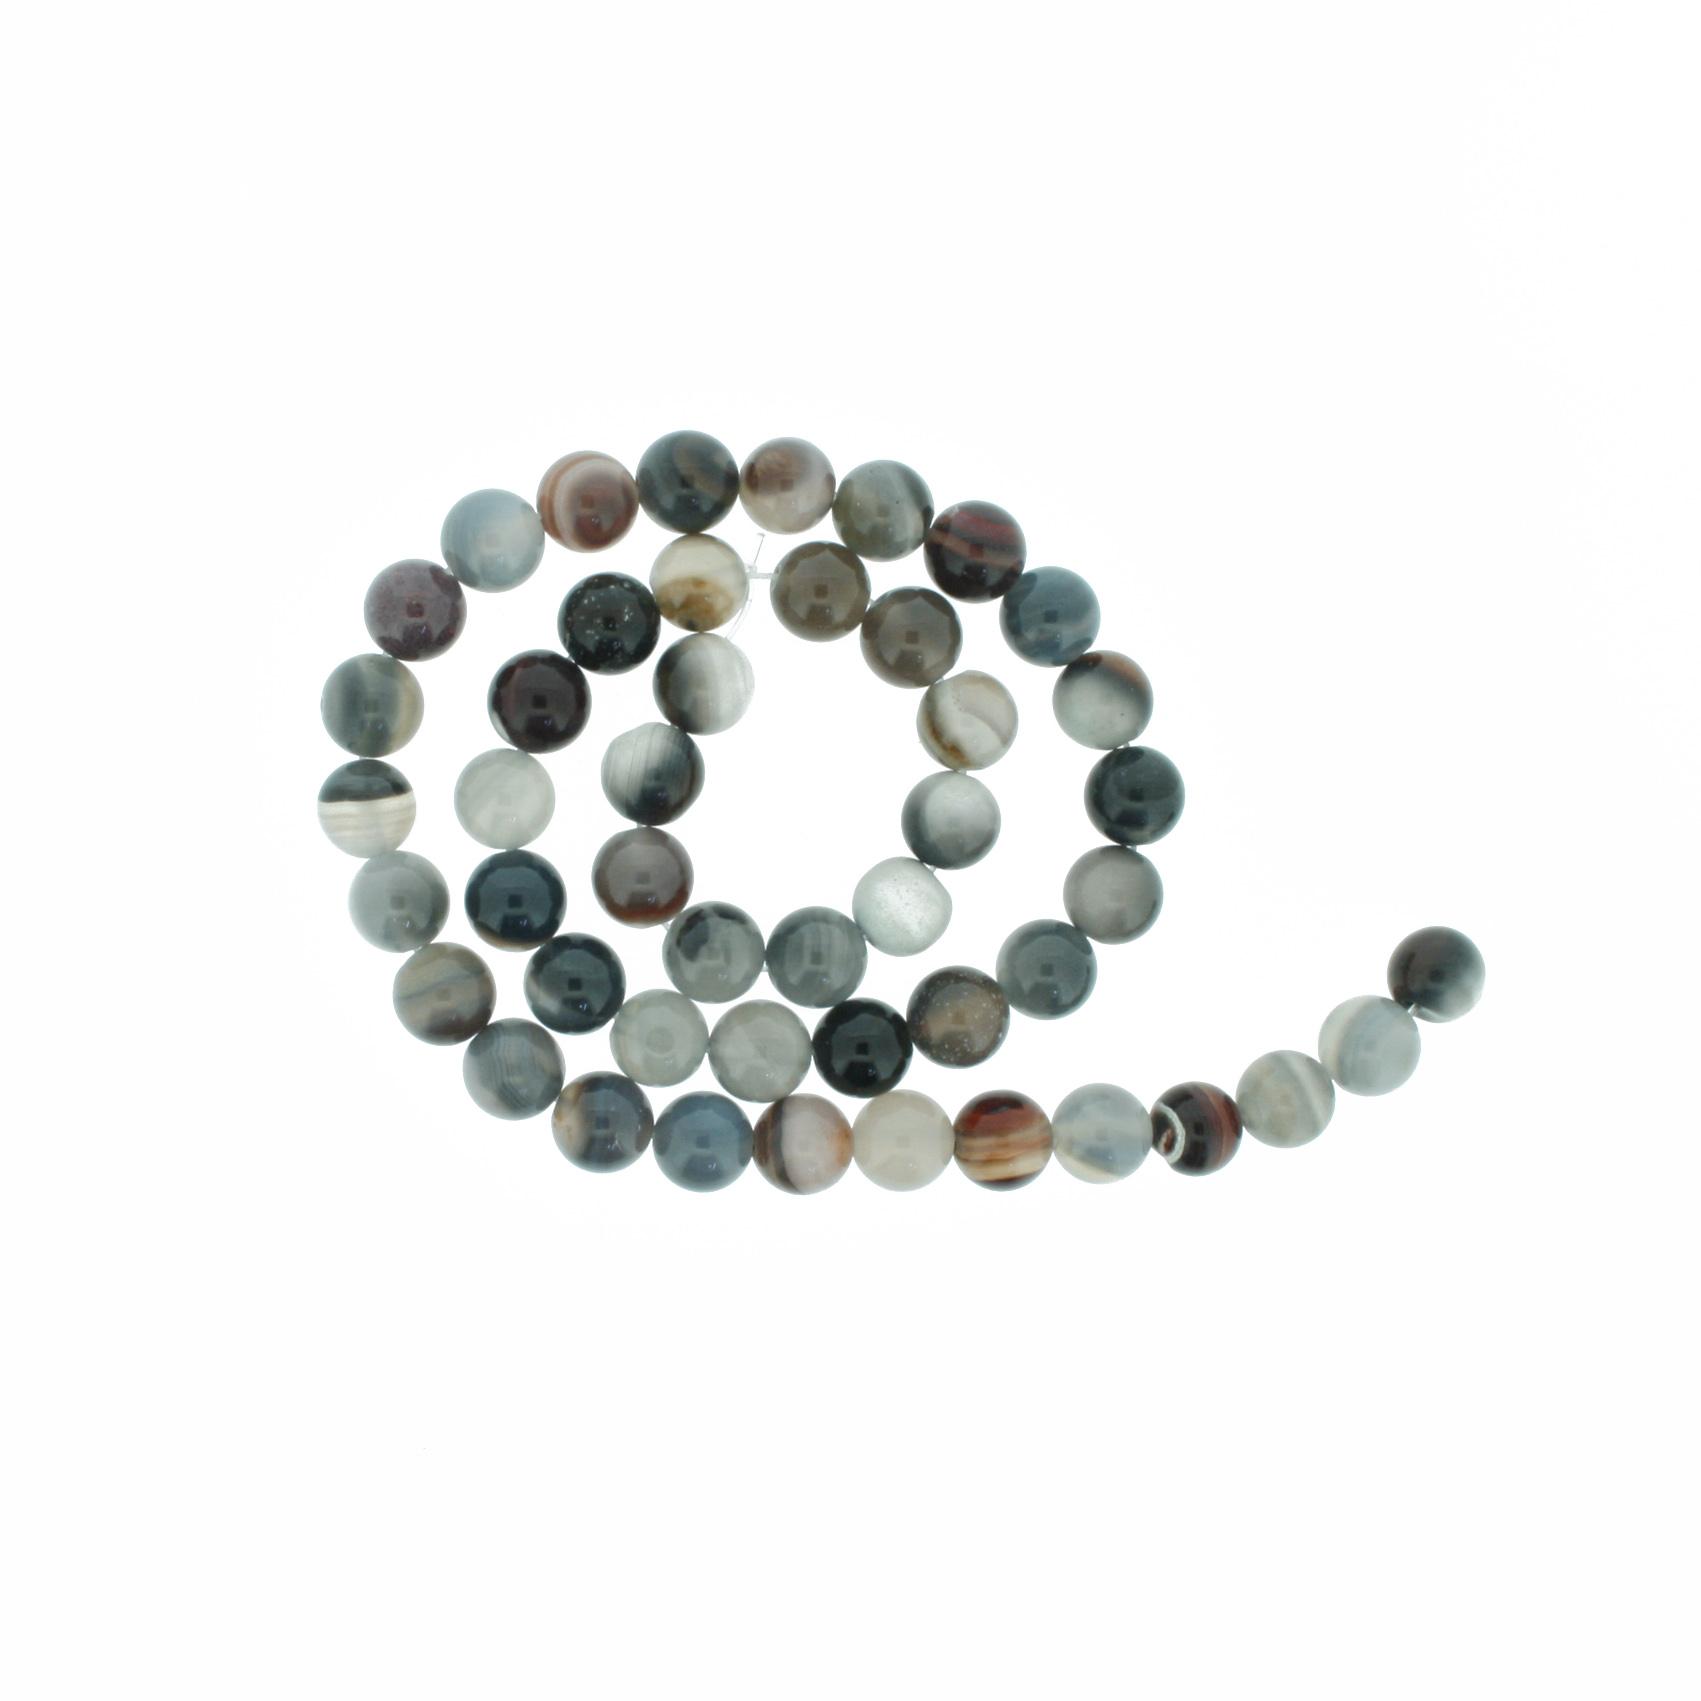 Fio de Pedra - Ágata Botswana - 8mm  - Stéphanie Bijoux® - Peças para Bijuterias e Artesanato